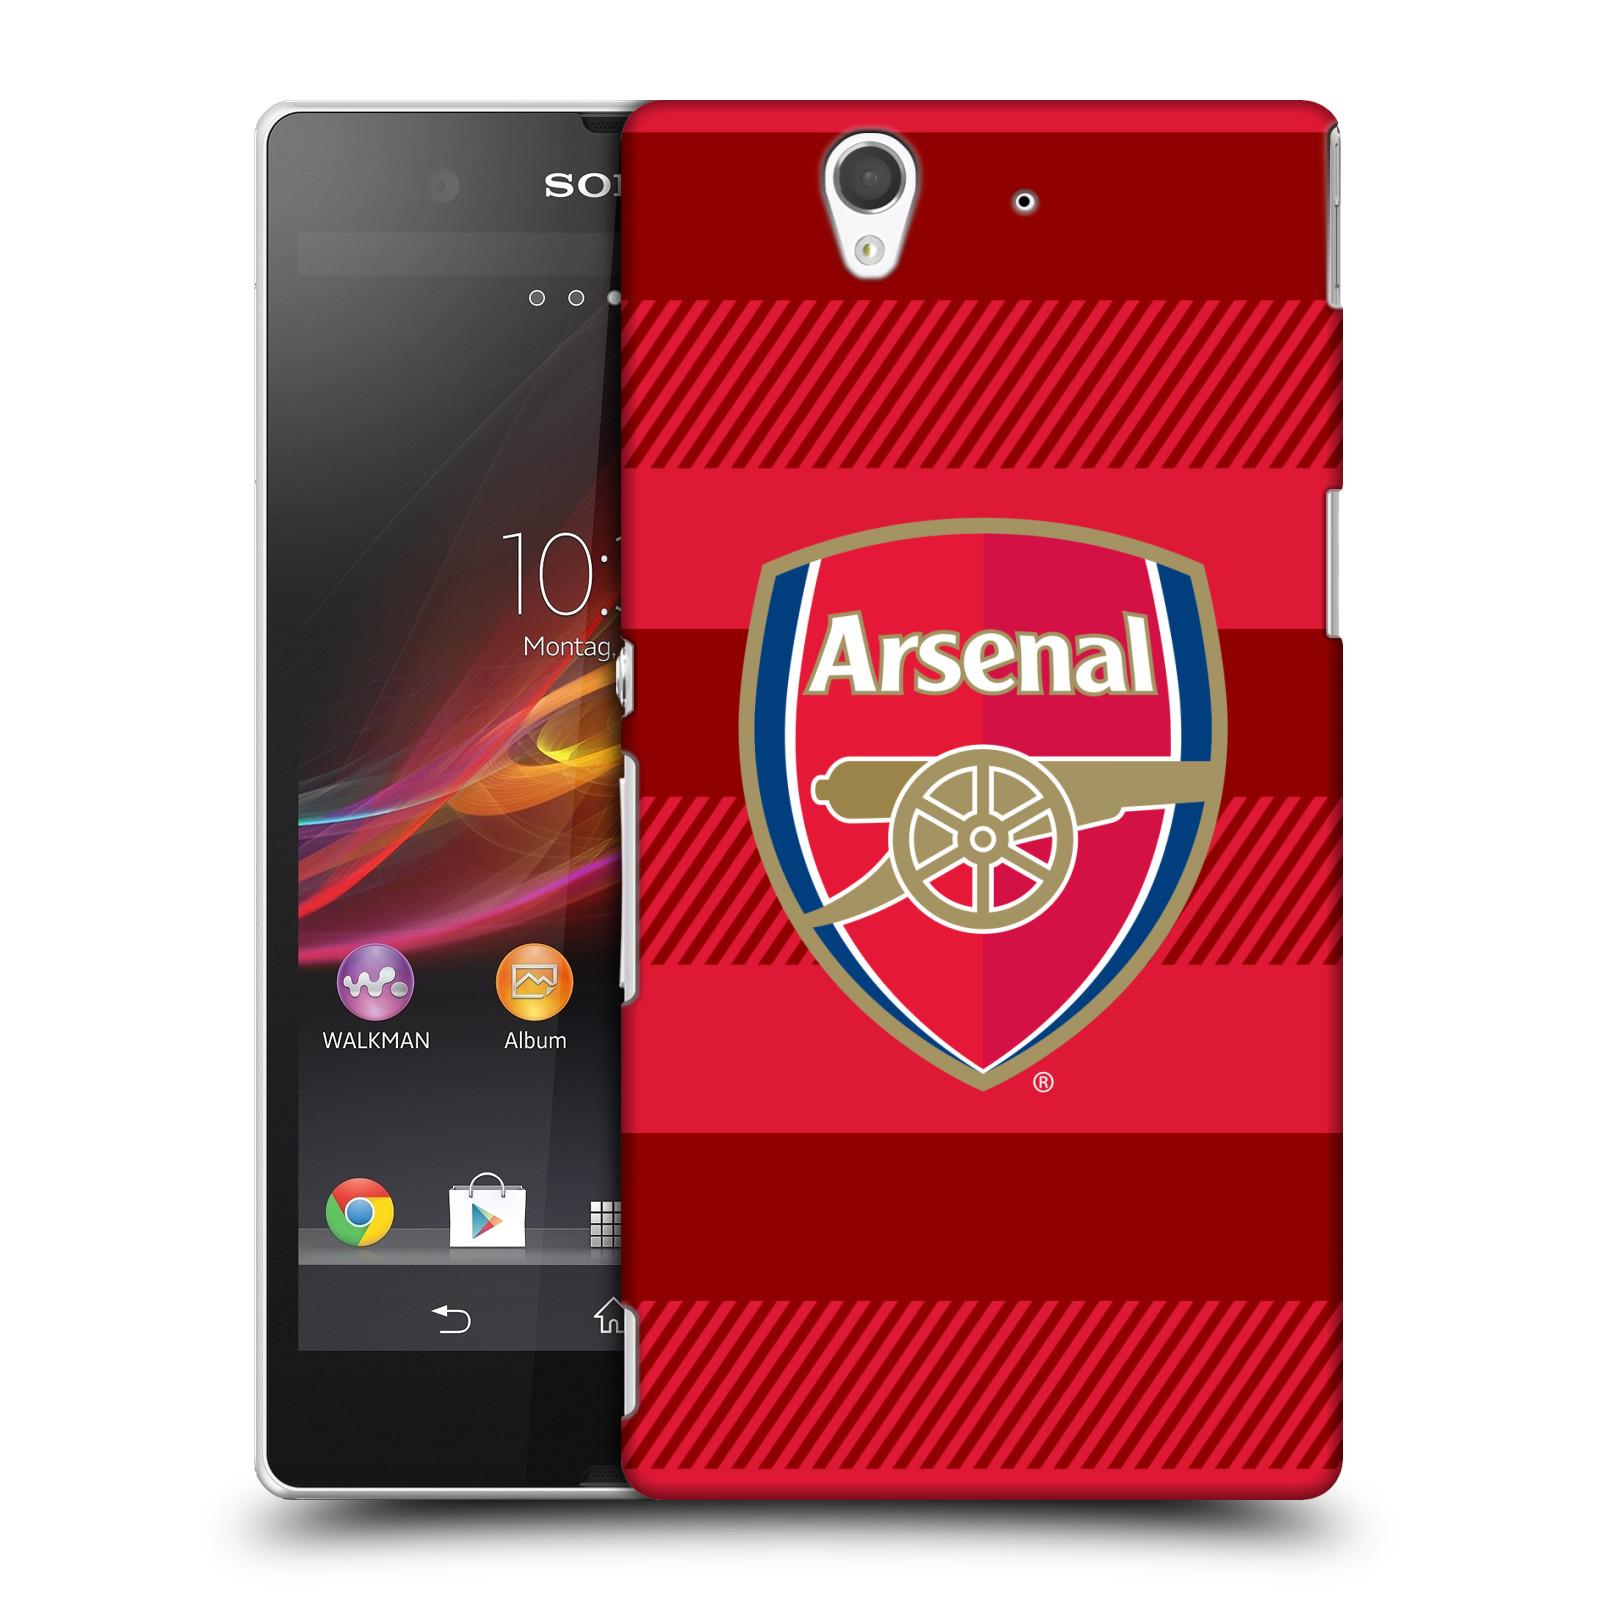 Plastové pouzdro na mobil Sony Xperia Z C6603 - Head Case - Arsenal FC - Logo s pruhy